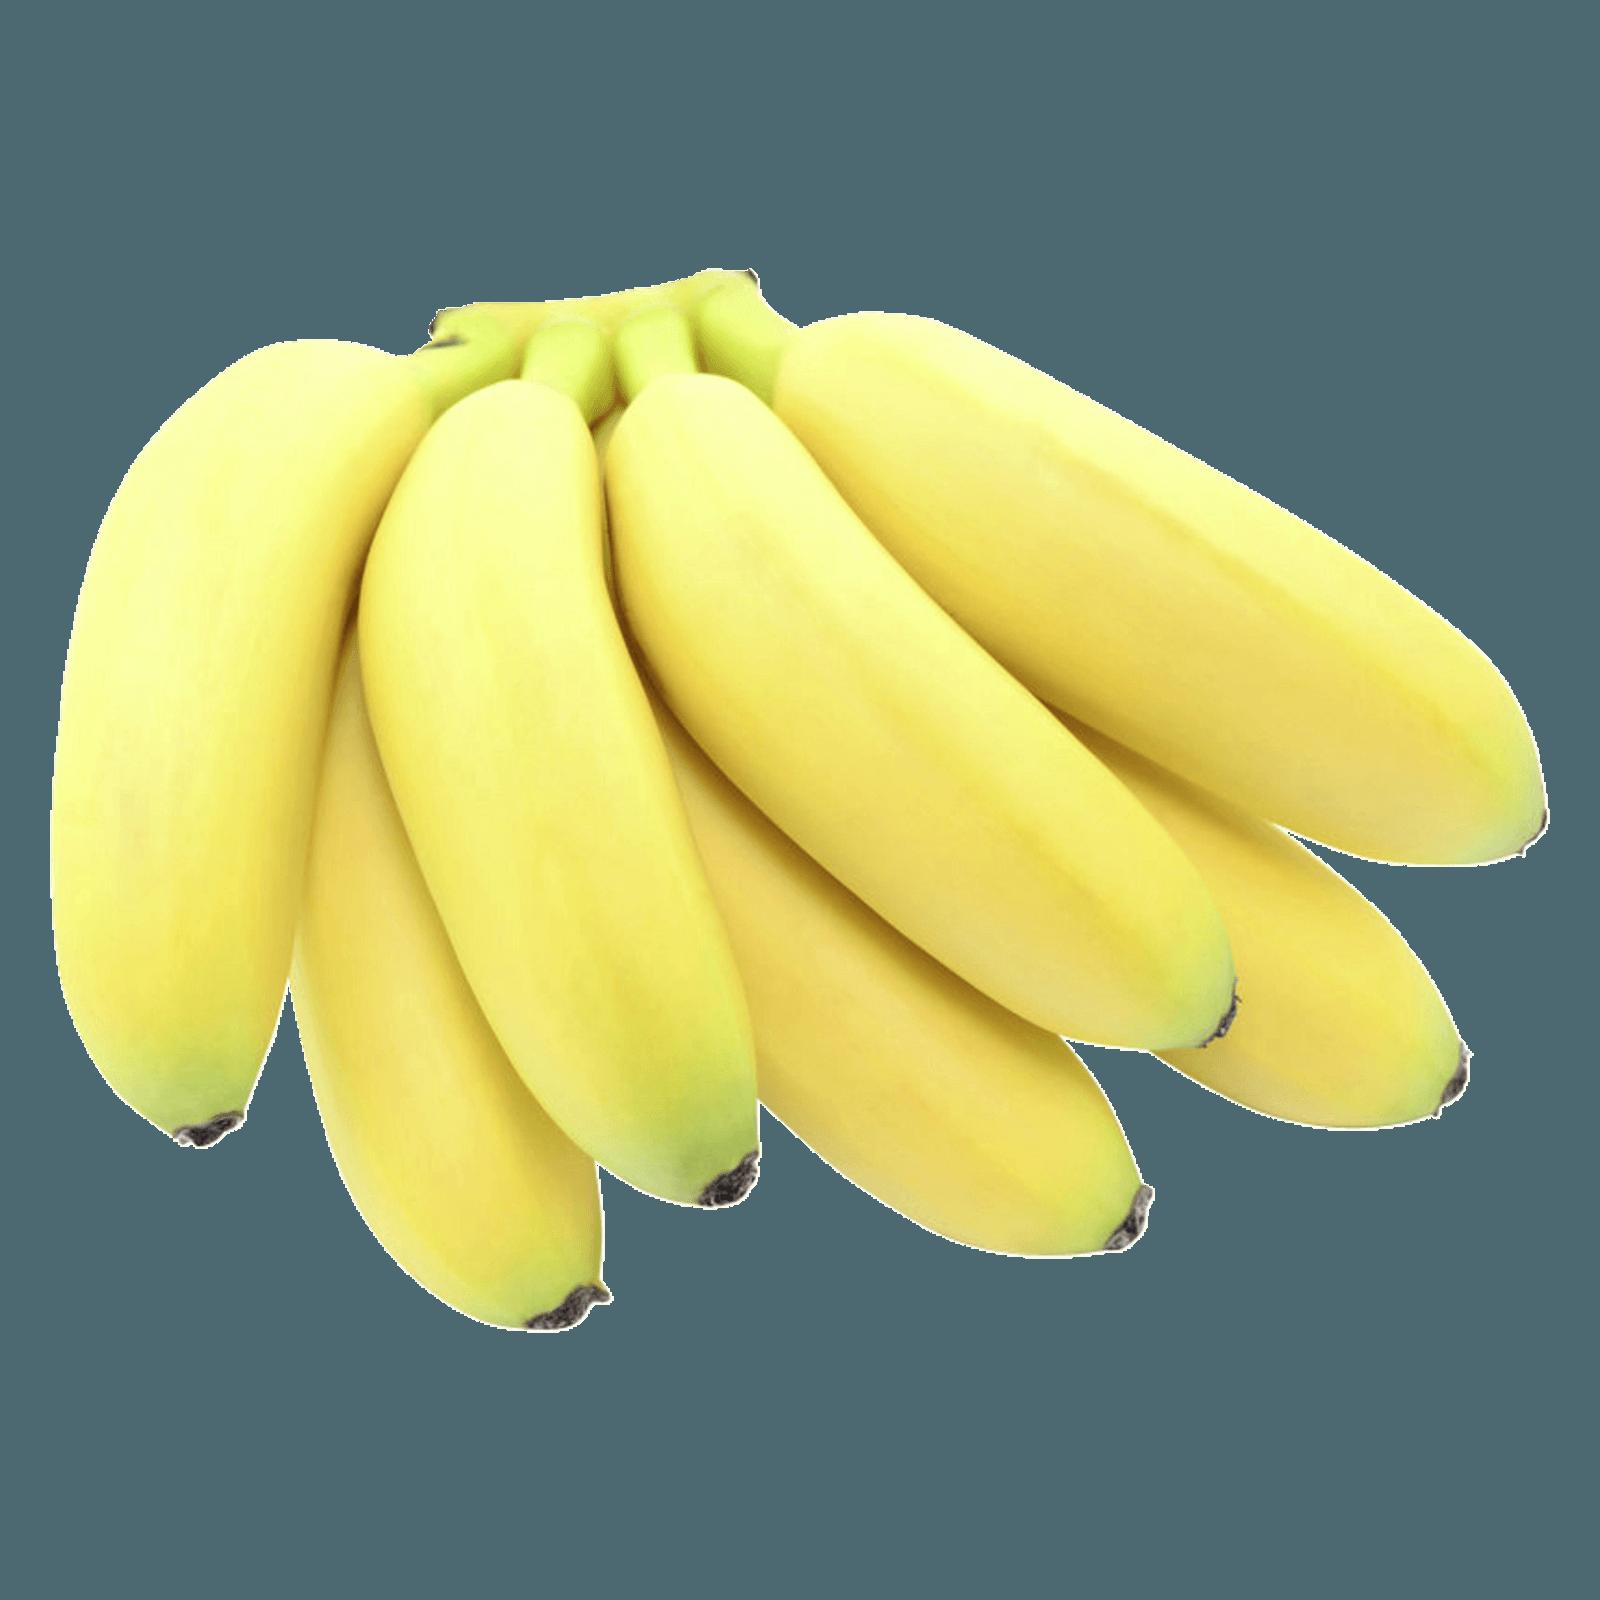 Atemberaubend Bananen online kaufen | REWE &OB_95